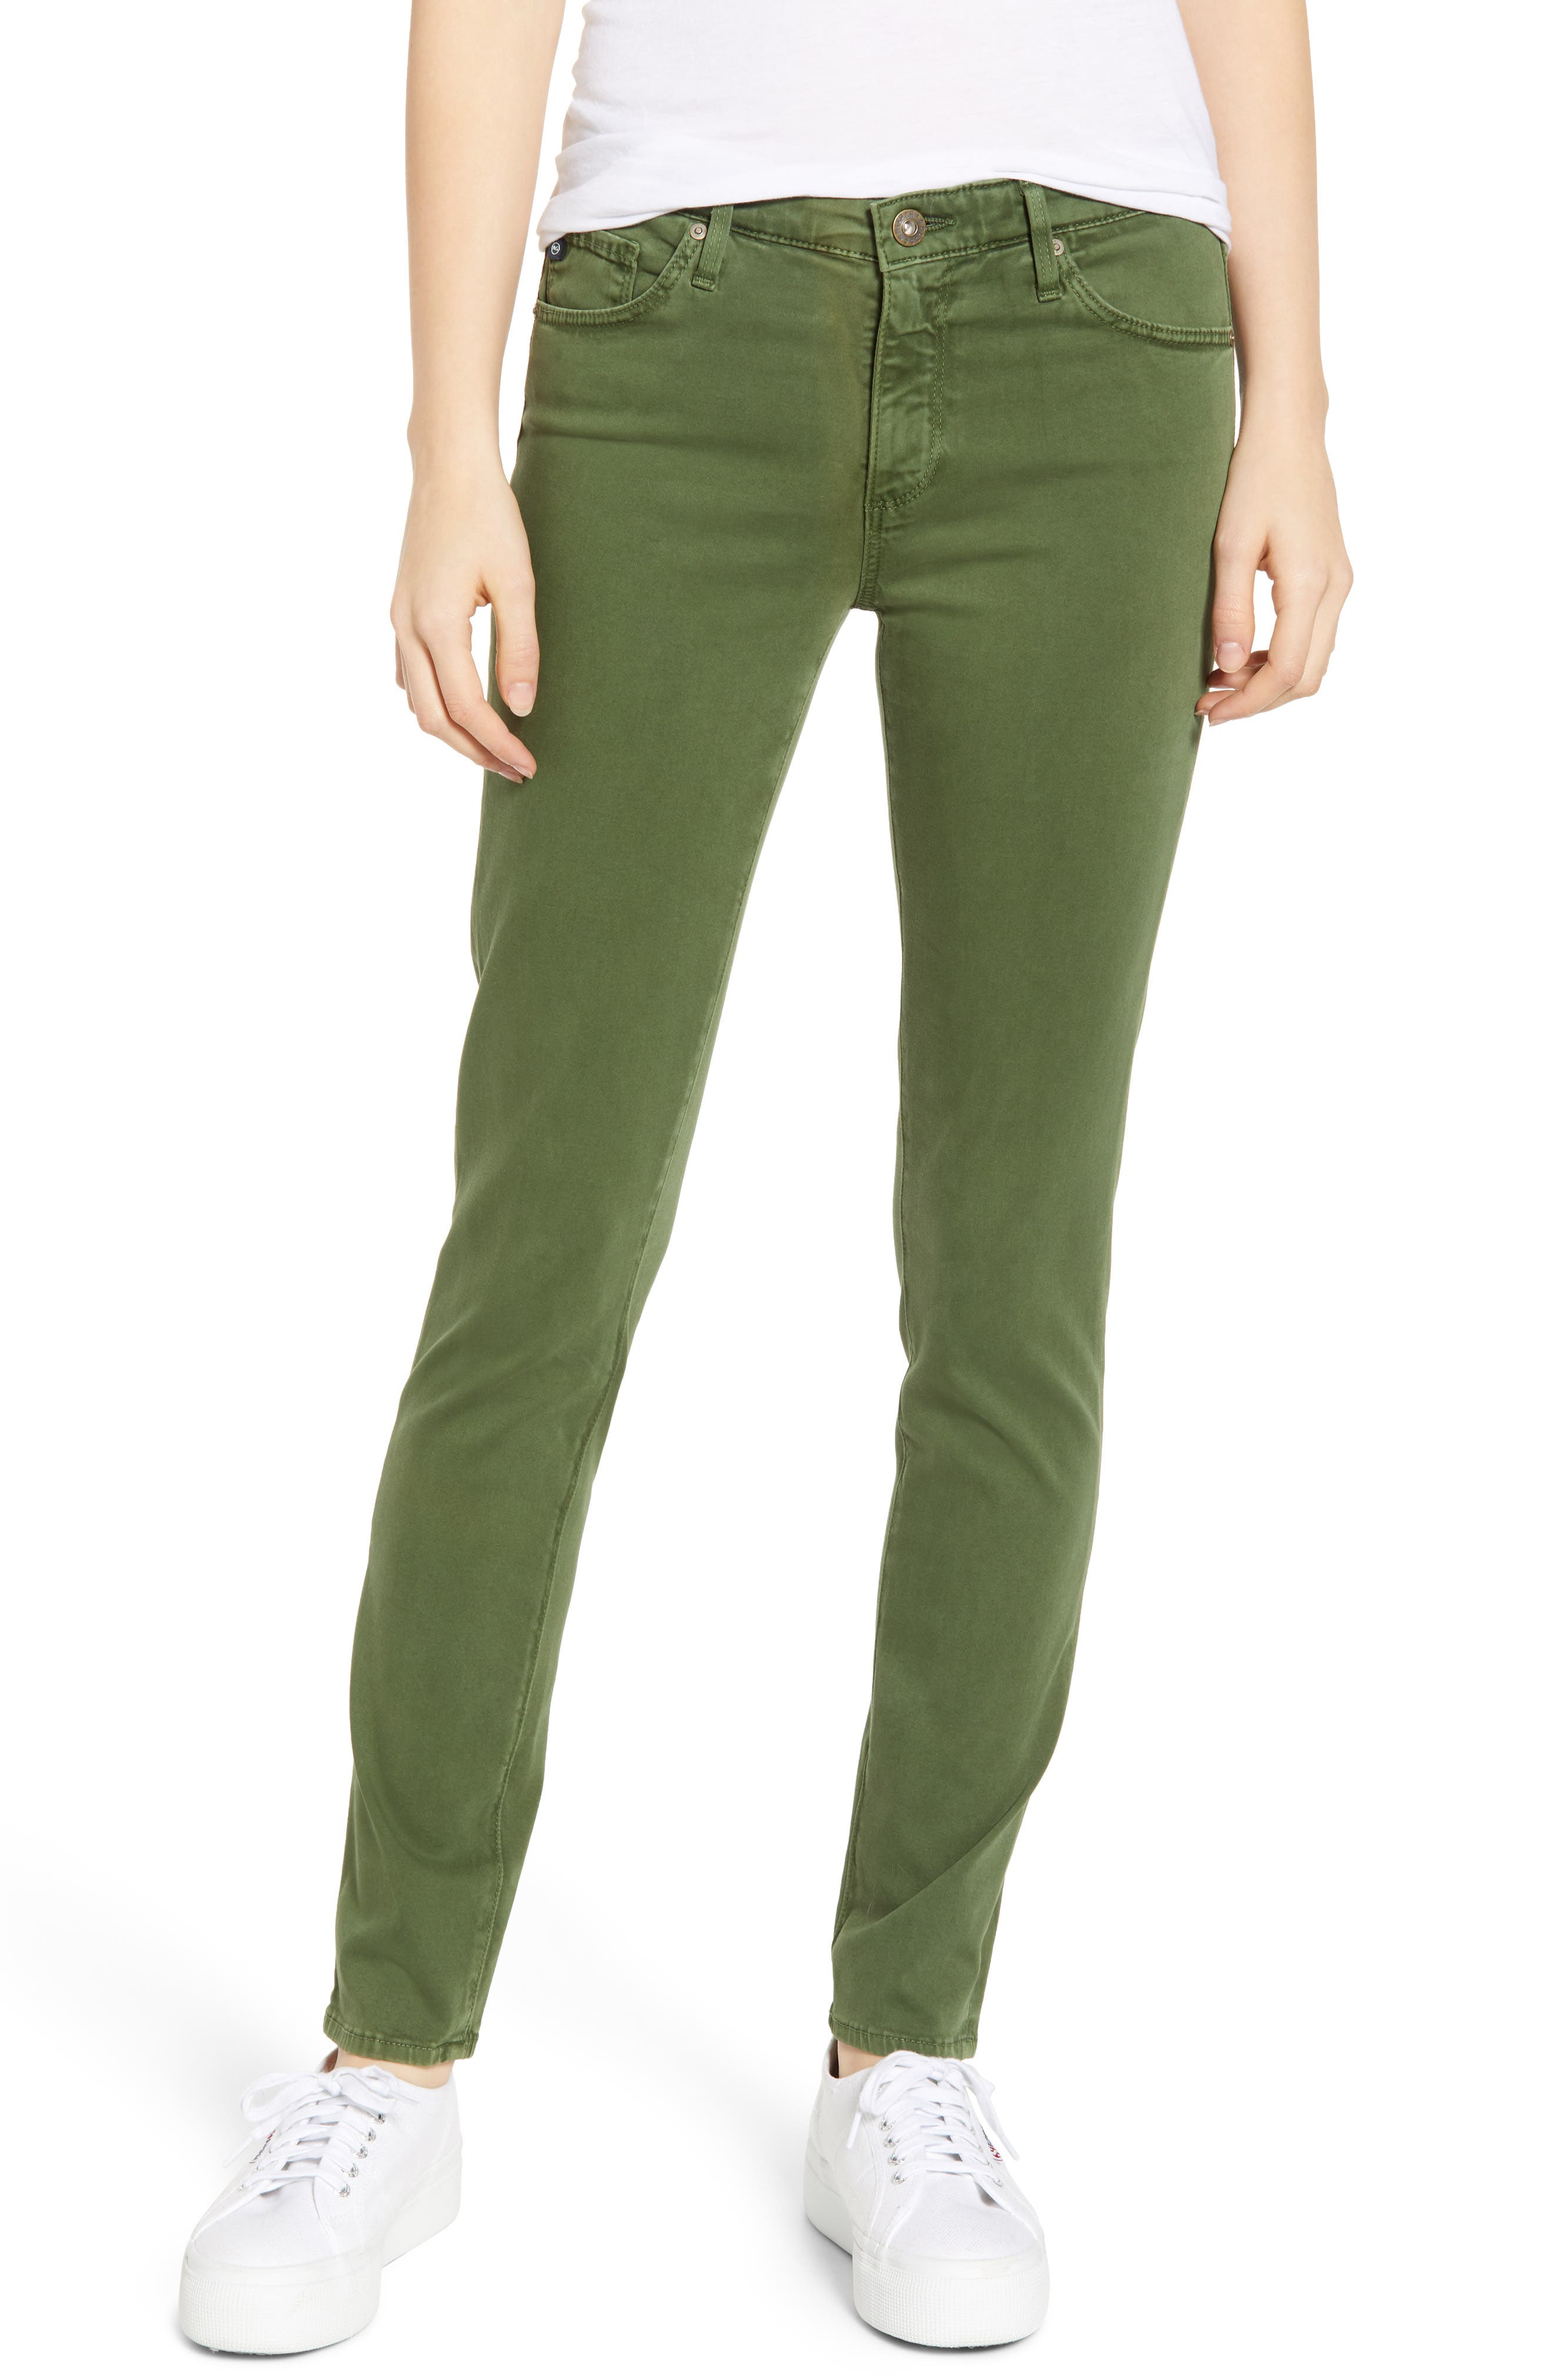 AG, 'The Prima' Cigarette Leg Skinny Jeans, Main thumbnail 1, color, SULFUR NEW SPRUCE